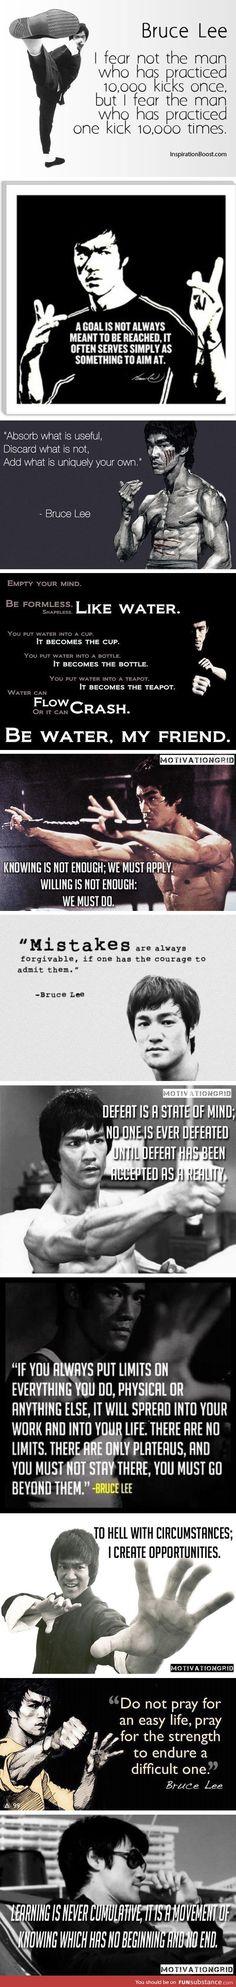 Bruce lee wisdom